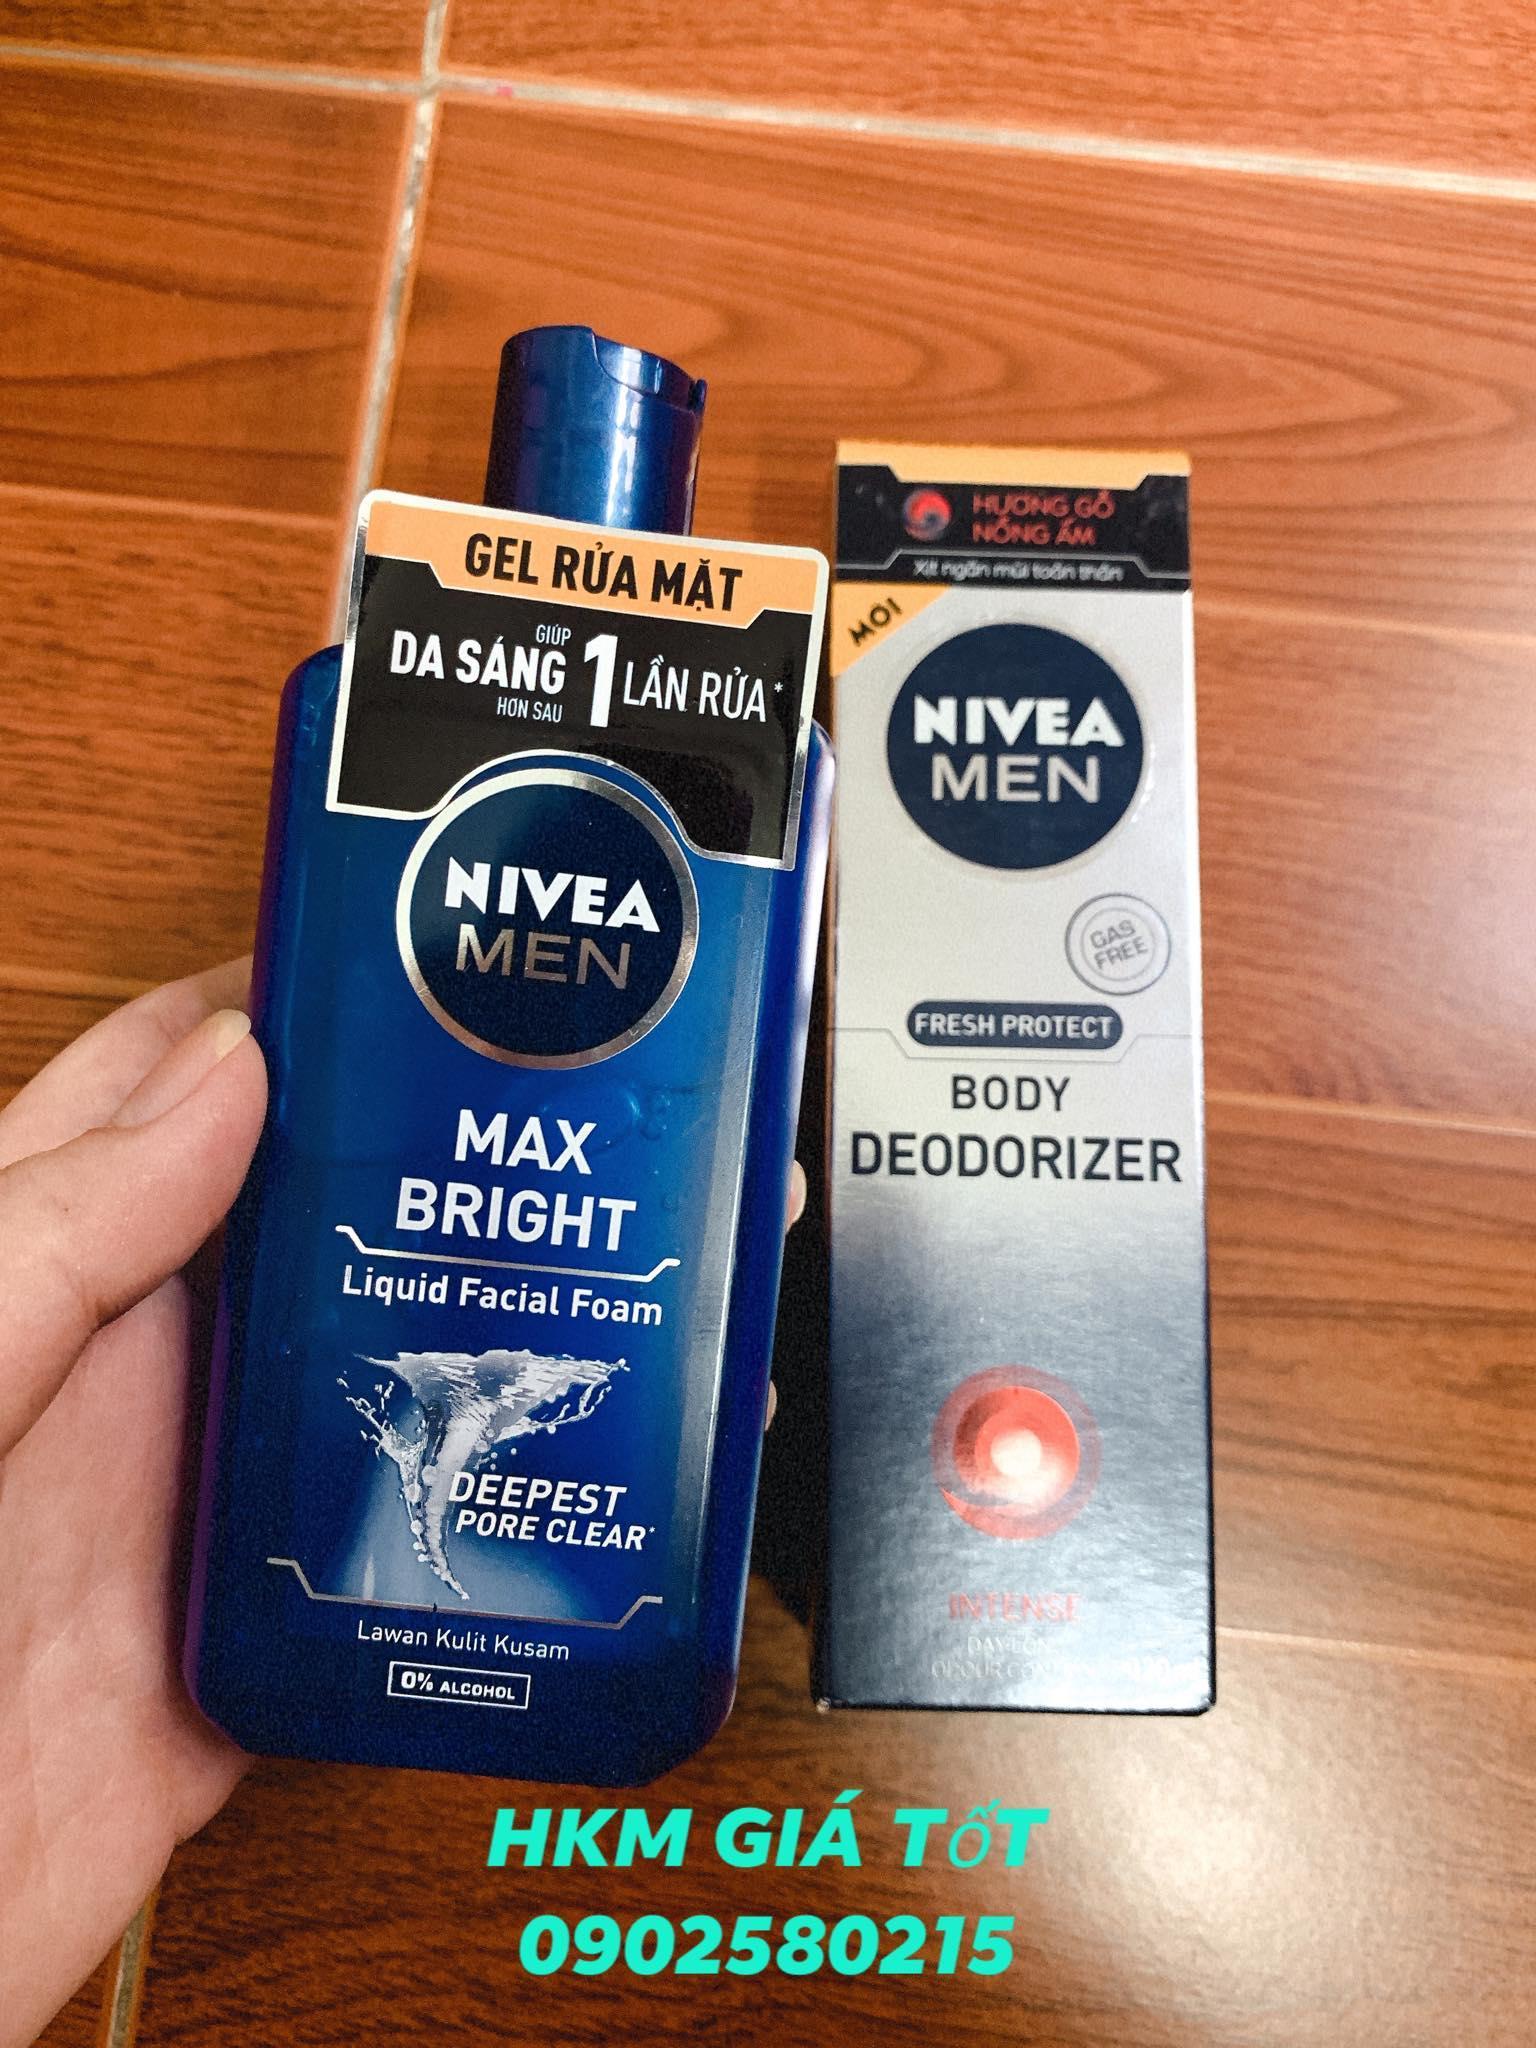 Combo Gel Rửa Mặt Nivea Men 150ml + Xịt Ngăn Mùi Toàn Thân Nivea Men 120ml nhập khẩu